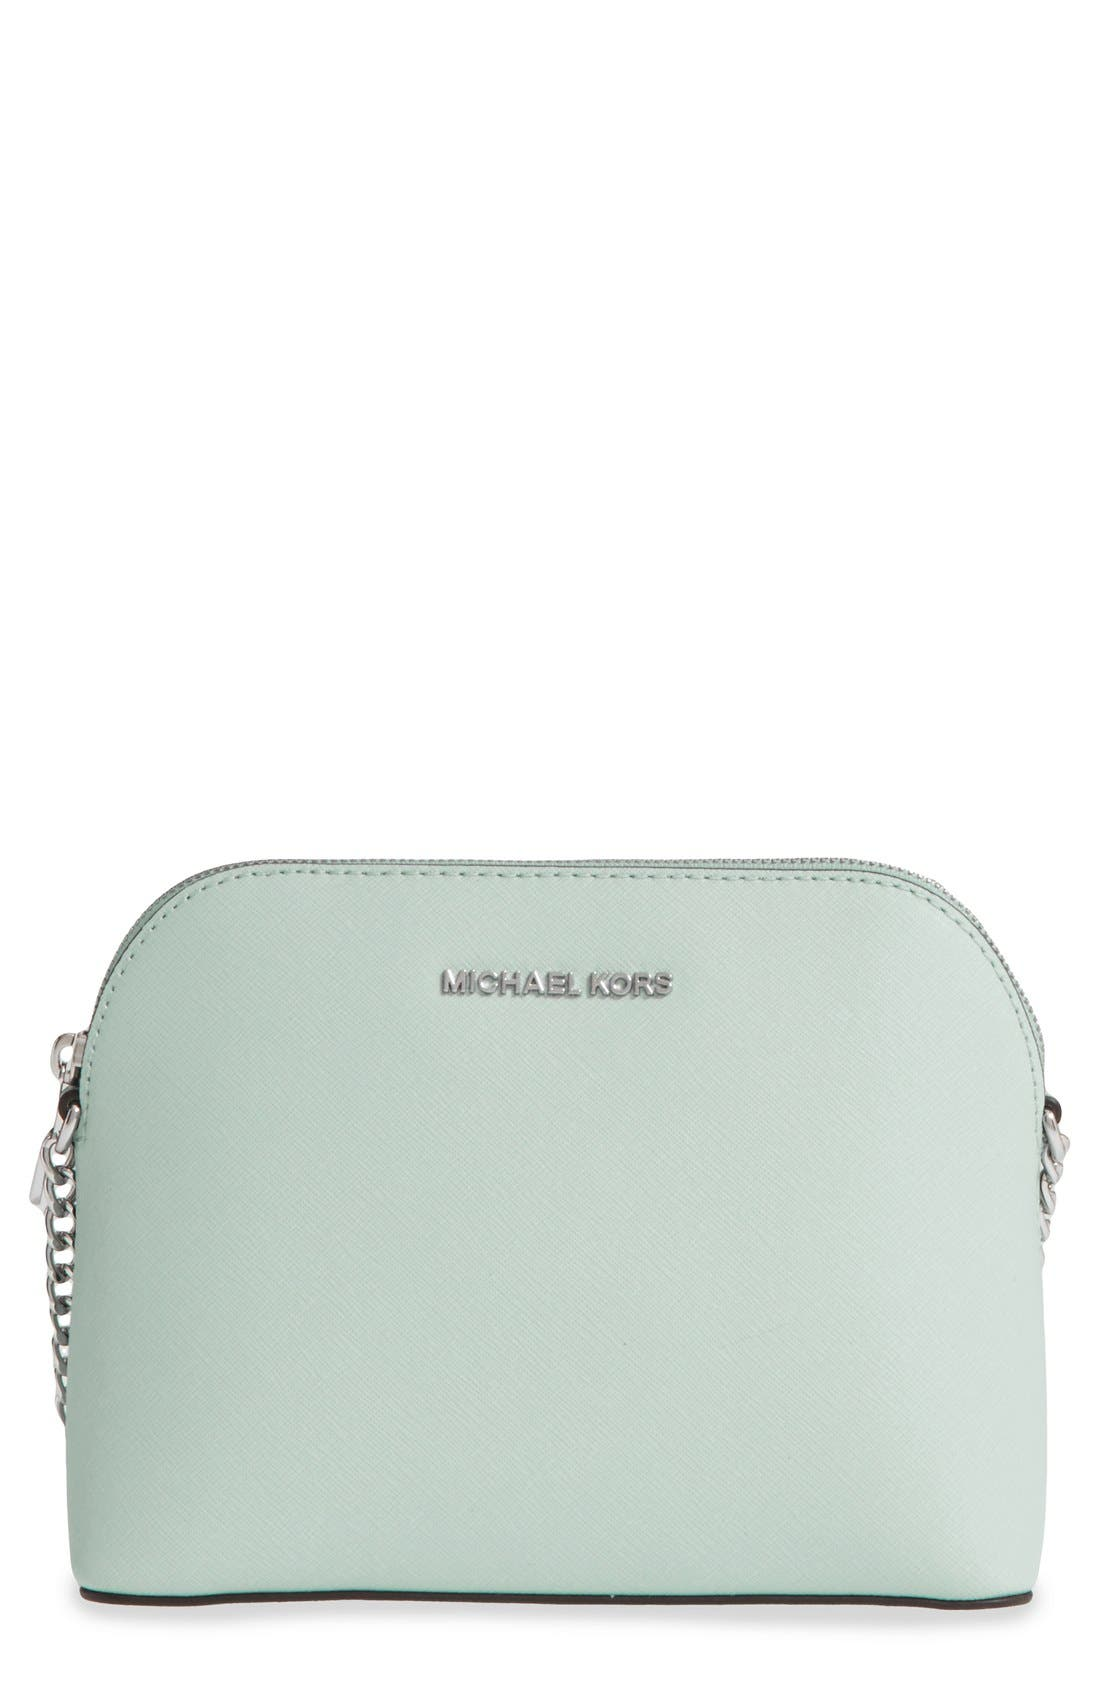 Alternate Image 1 Selected - MICHAEL Michael Kors 'Large Cindy' Saffiano Leather Crossbody Bag